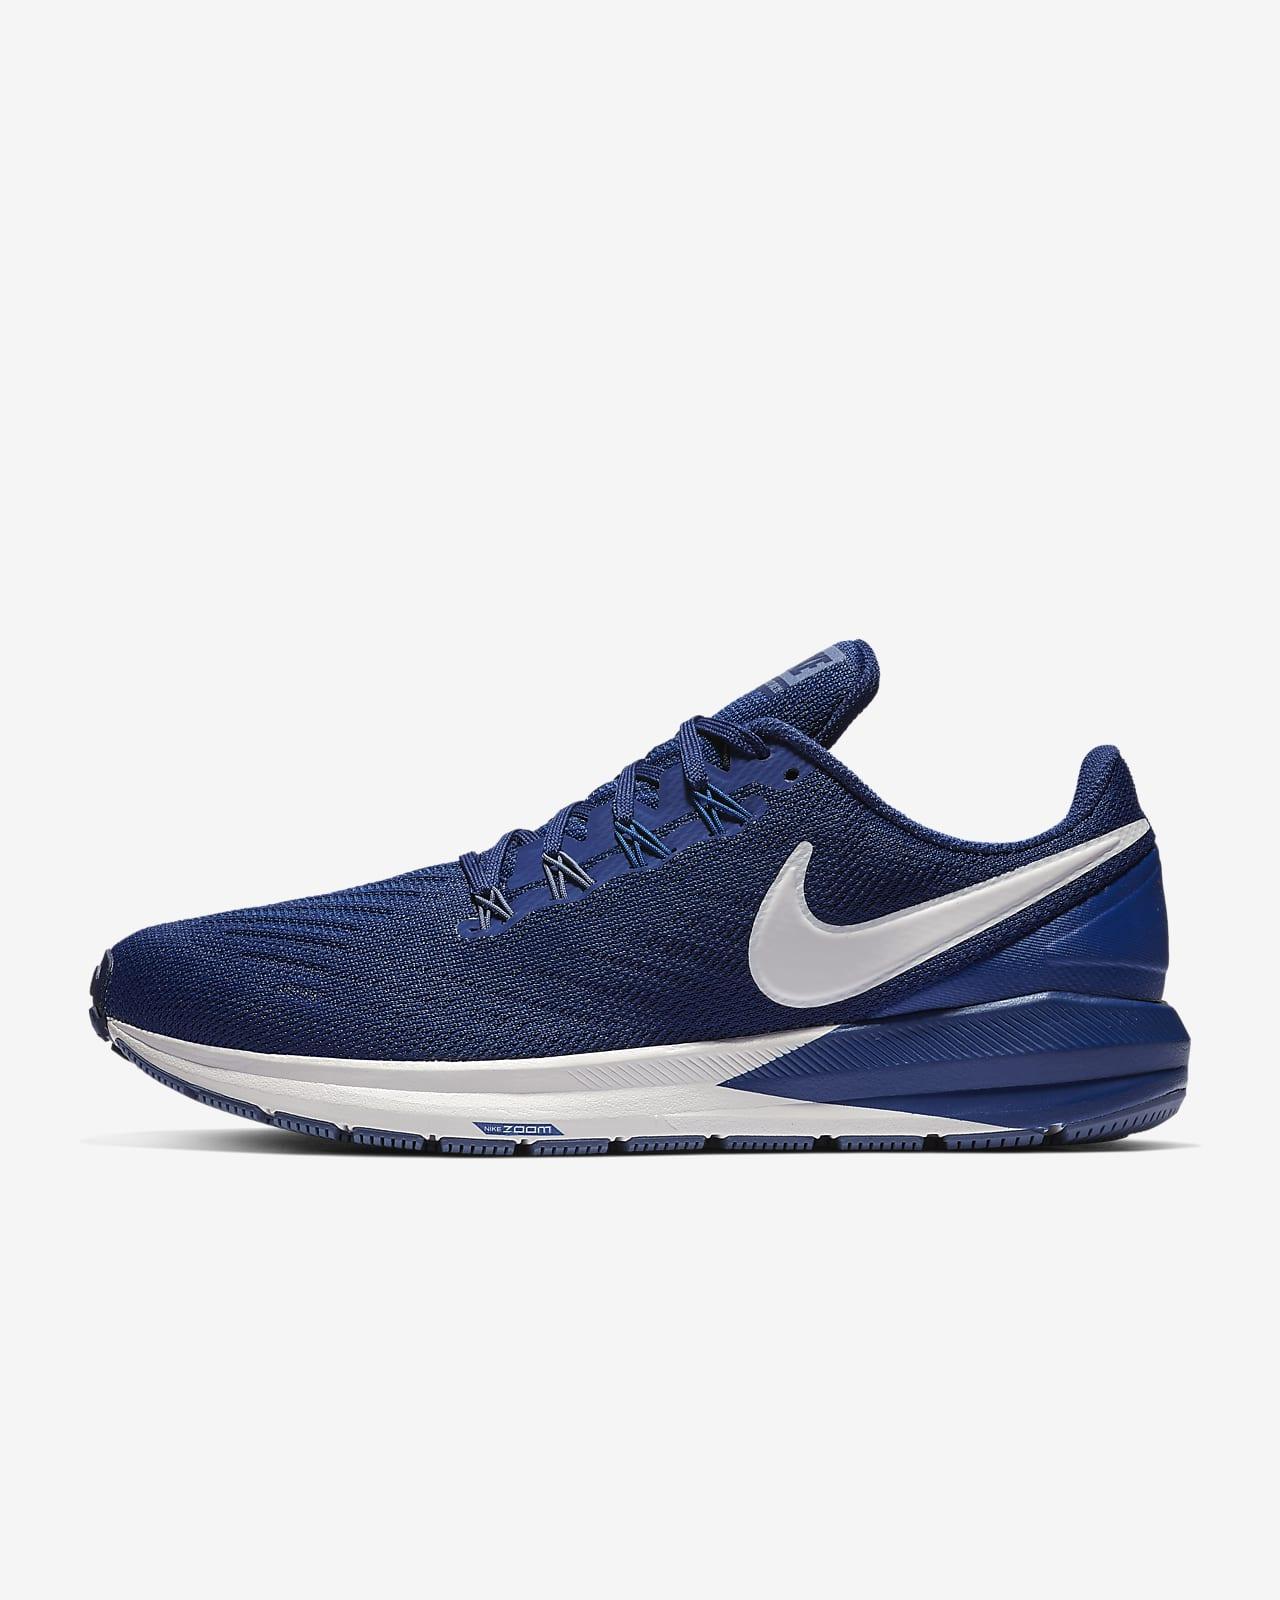 Estadísticas caja Inactivo  Nike Air Zoom Structure 22 Men's Running Shoe (Narrow). Nike CH